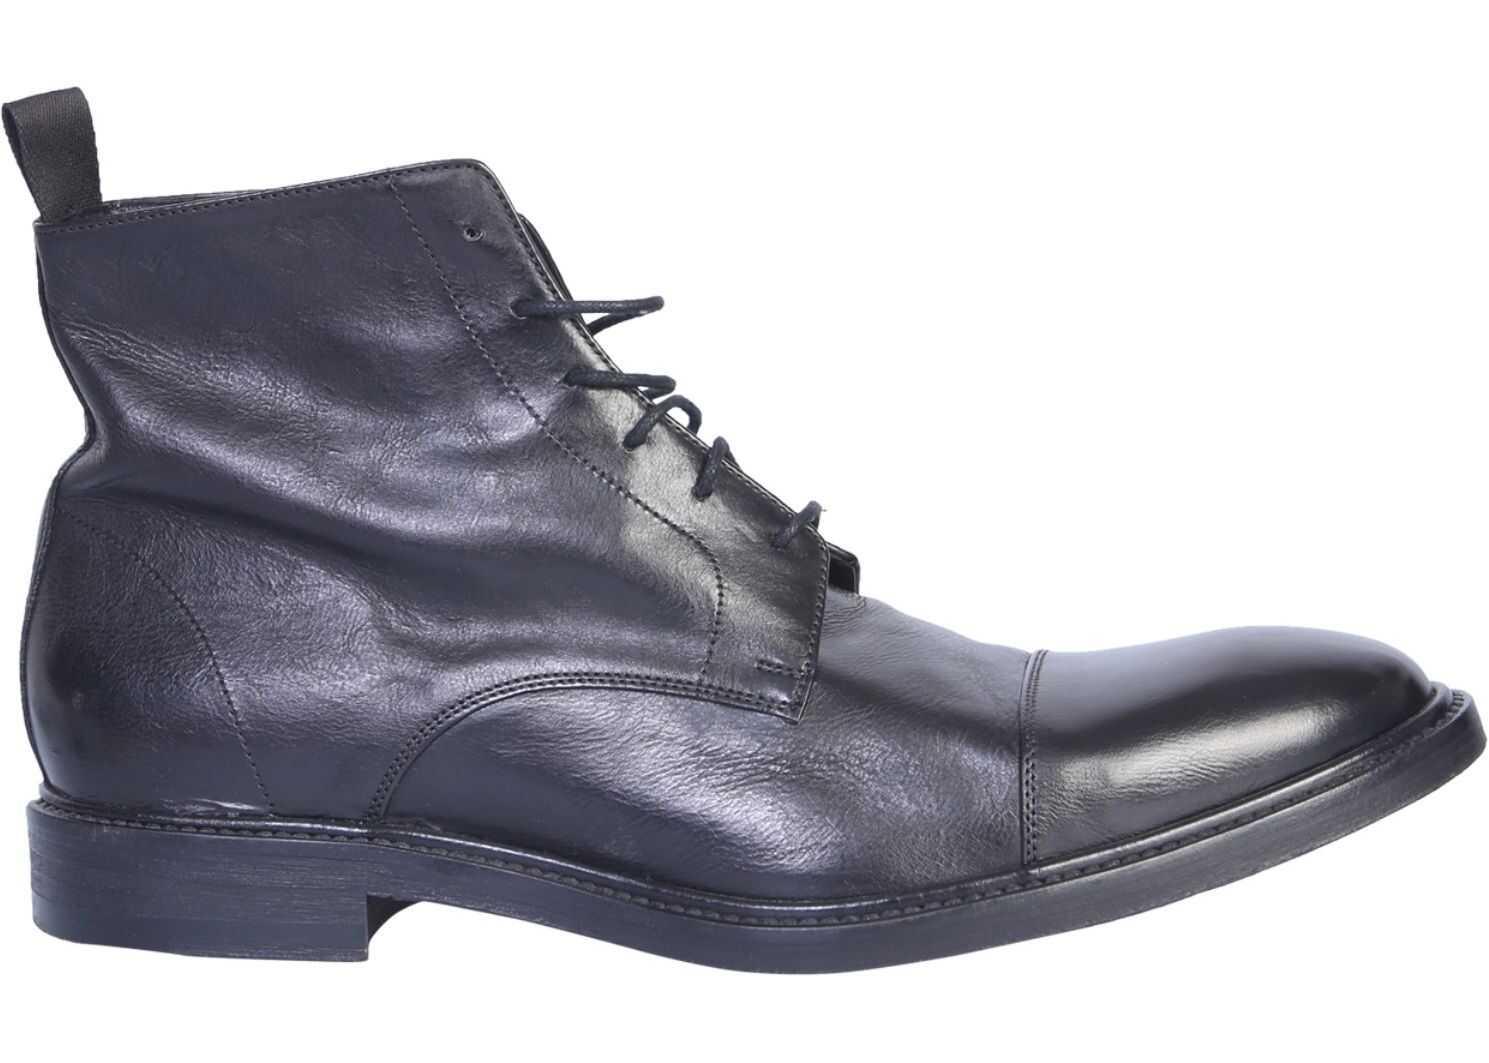 Paul Smith Jarman Boot BLACK